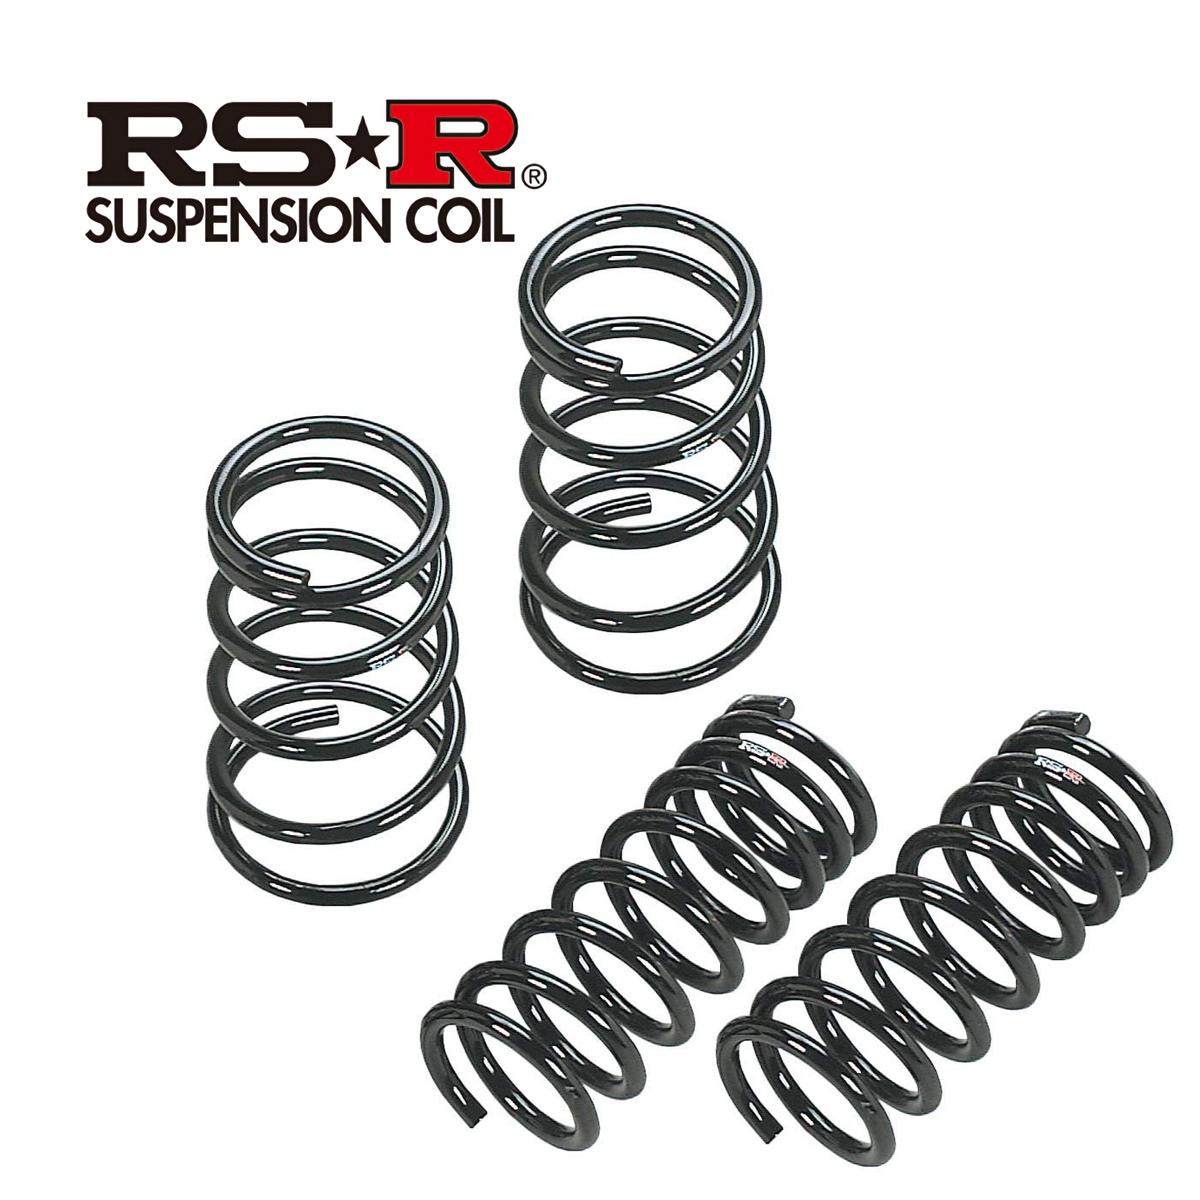 RS-R フレアクロスオーバー MS31S XT ダウンサス スプリング 1台分 S405TD Ti2000 ダウン RSR 個人宅発送追金有